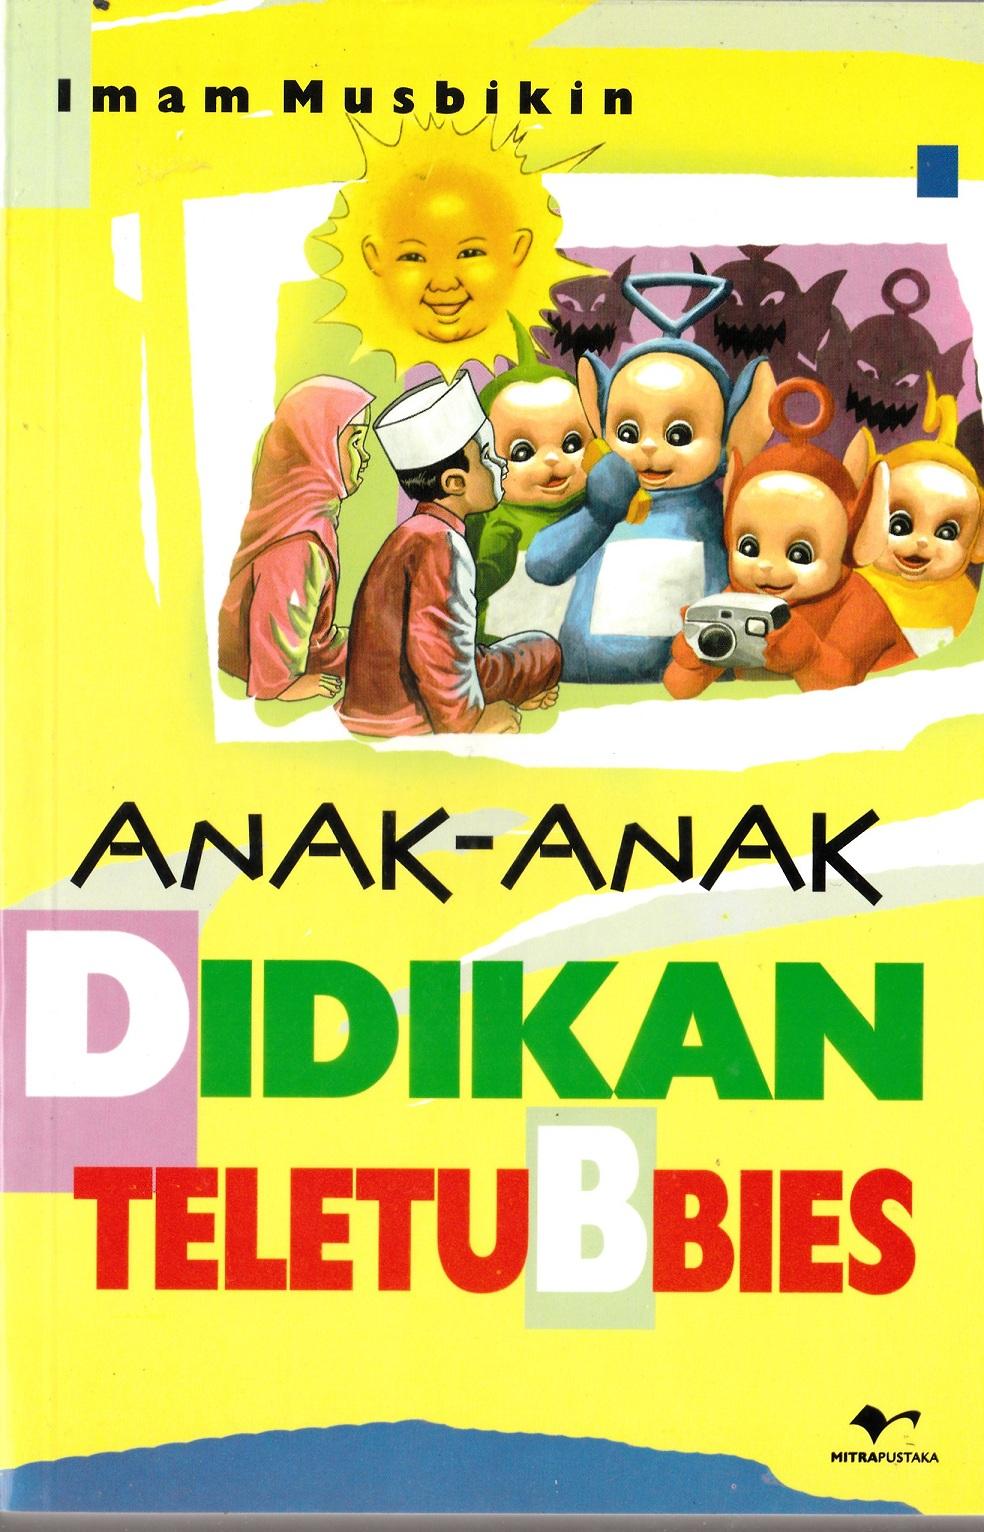 Anak-Anak Didikan Teletubbies